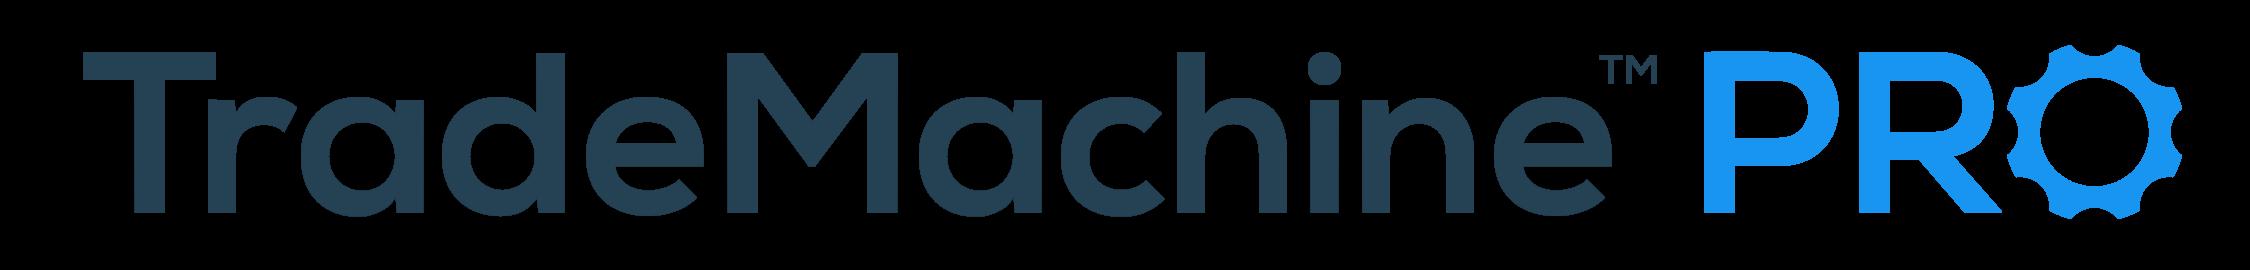 TradeMachine Pro Options Trading Software logo